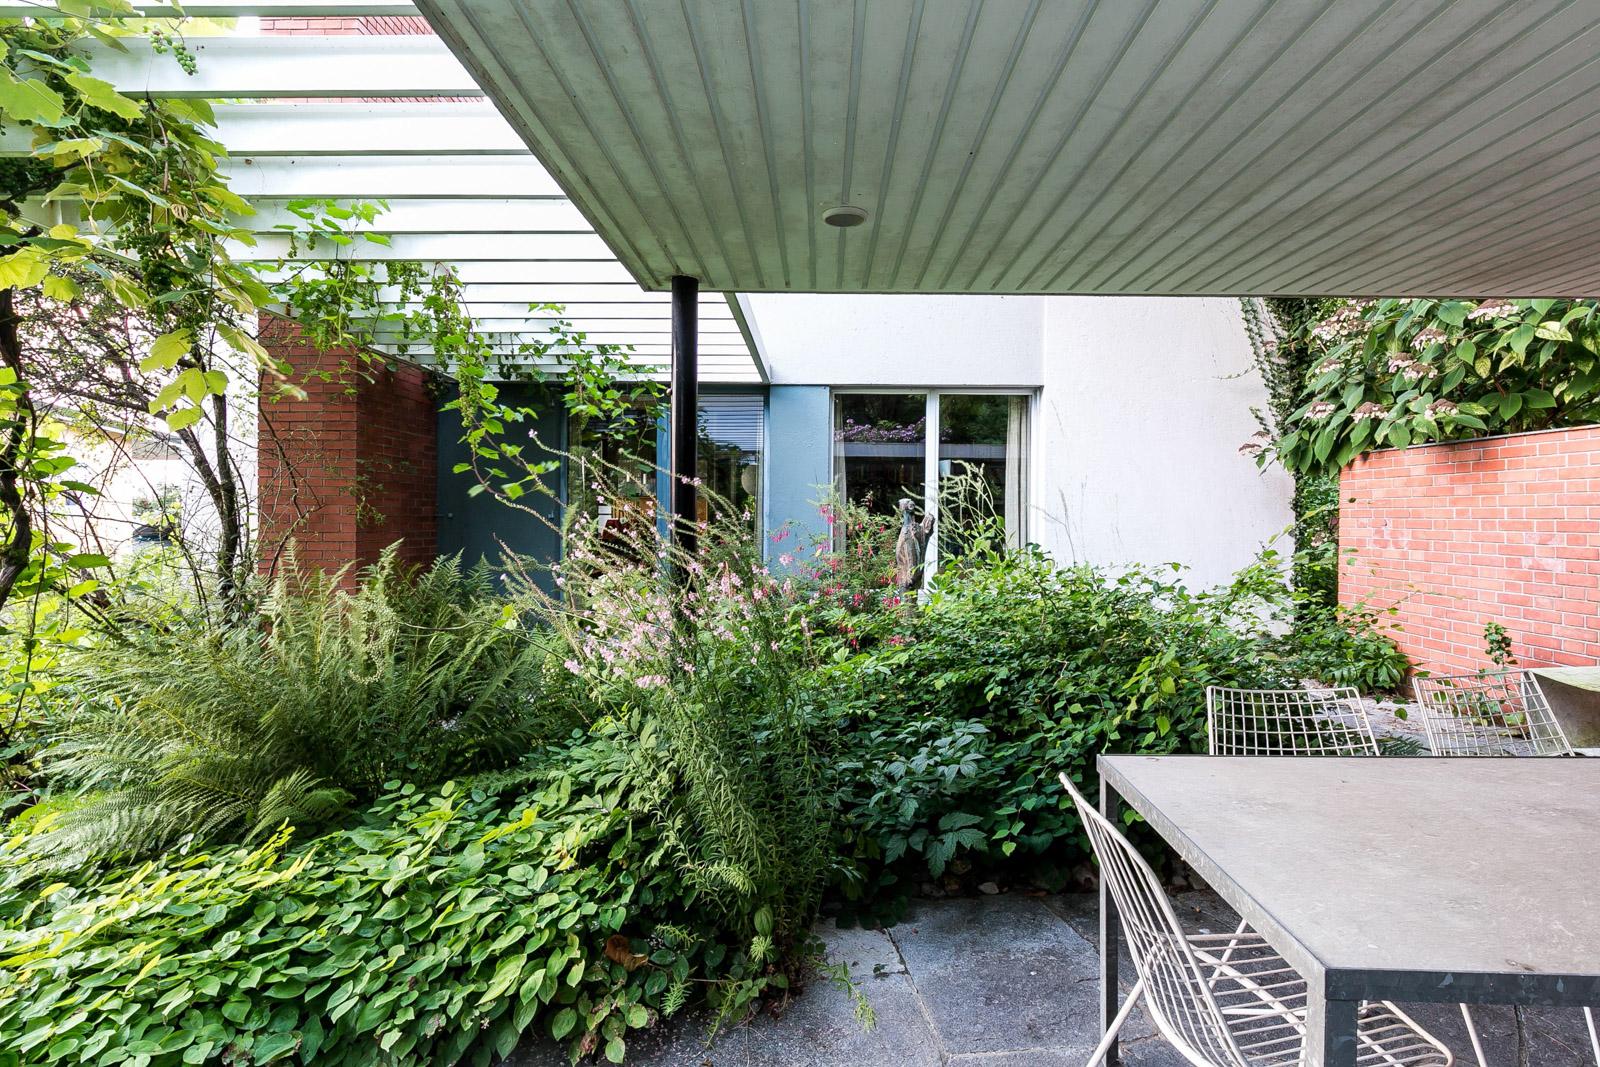 Haus Dalcher_web-3.jpg